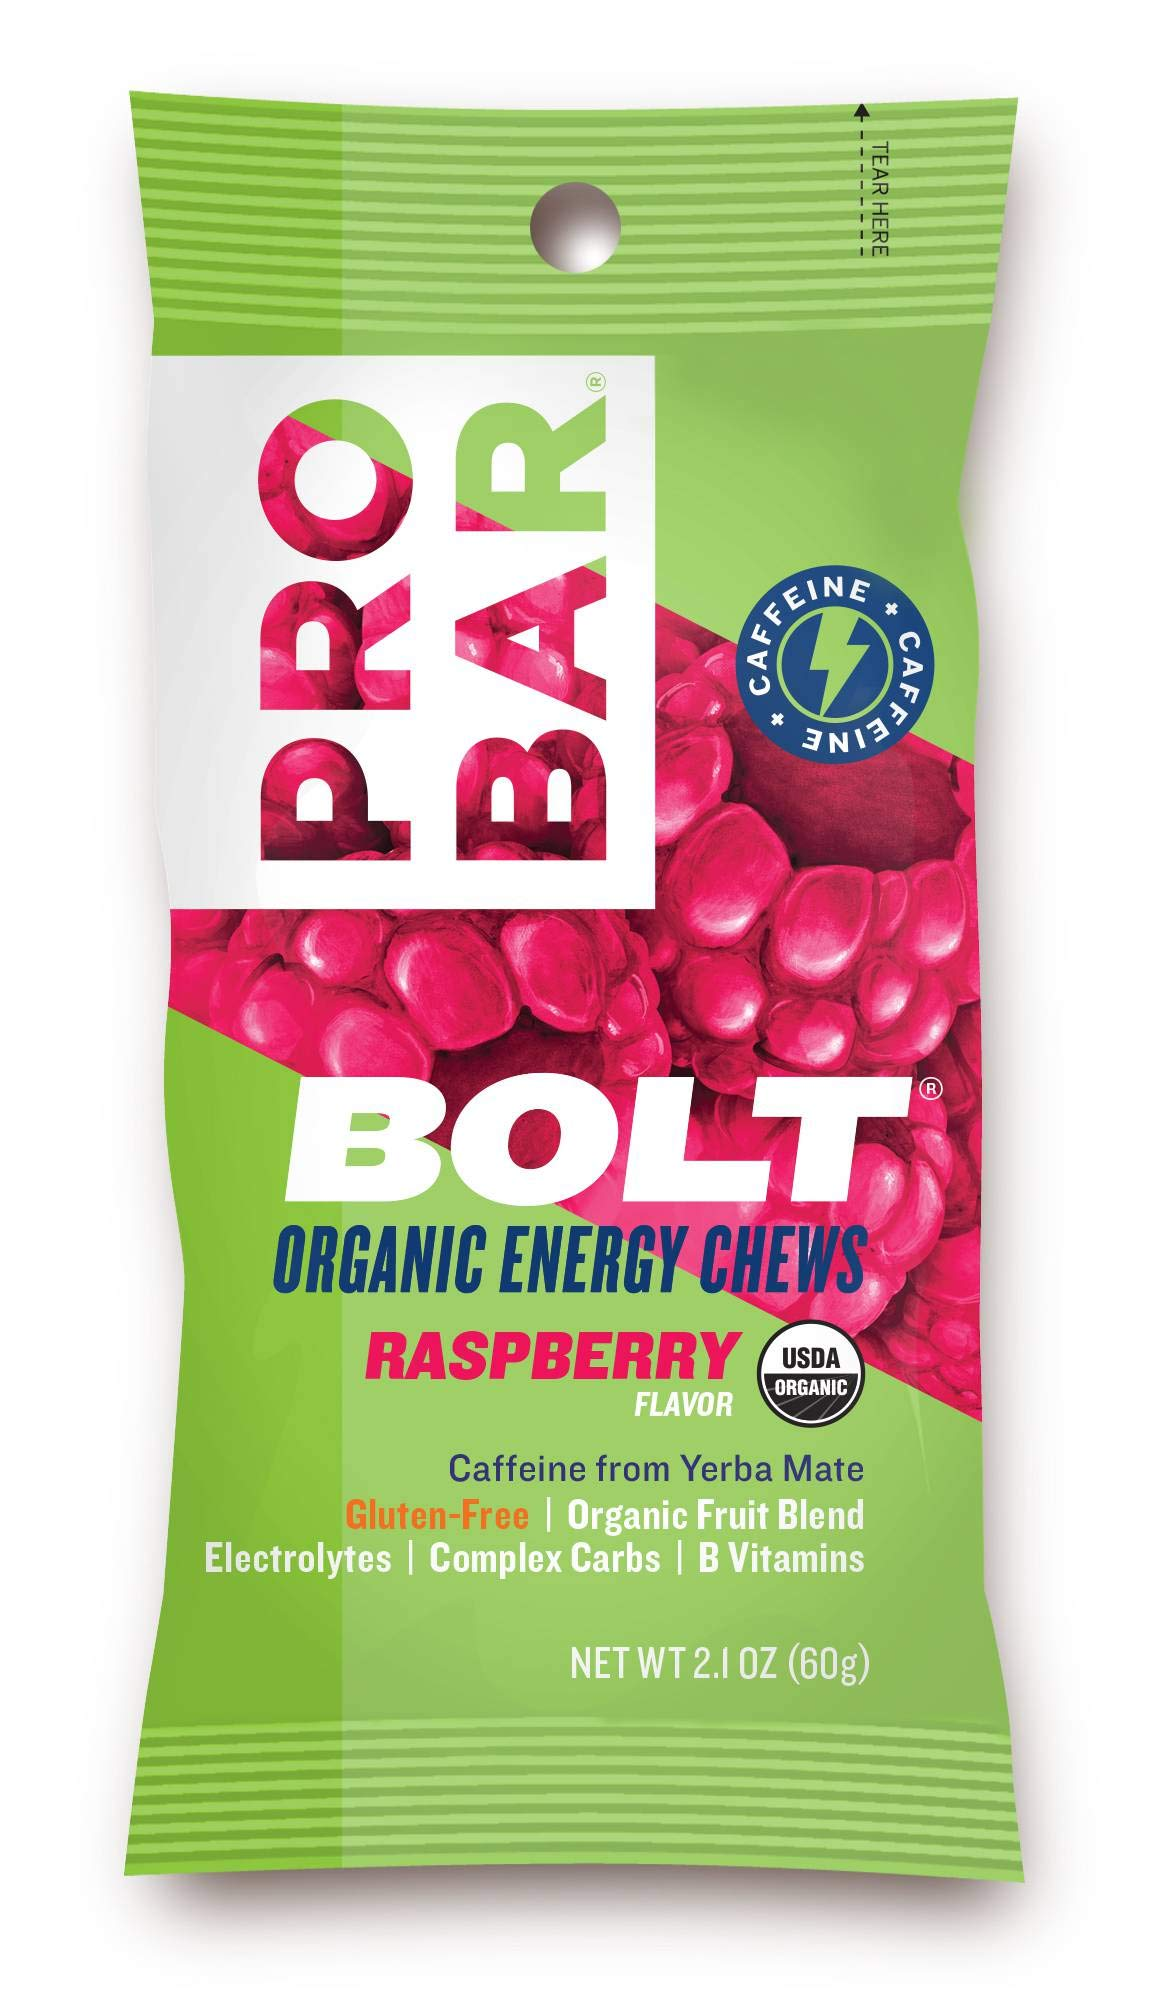 ProBar Raspberry Bolt Energy Chews, 2.1 oz., (144 per case) by ProBar Foods (Image #1)